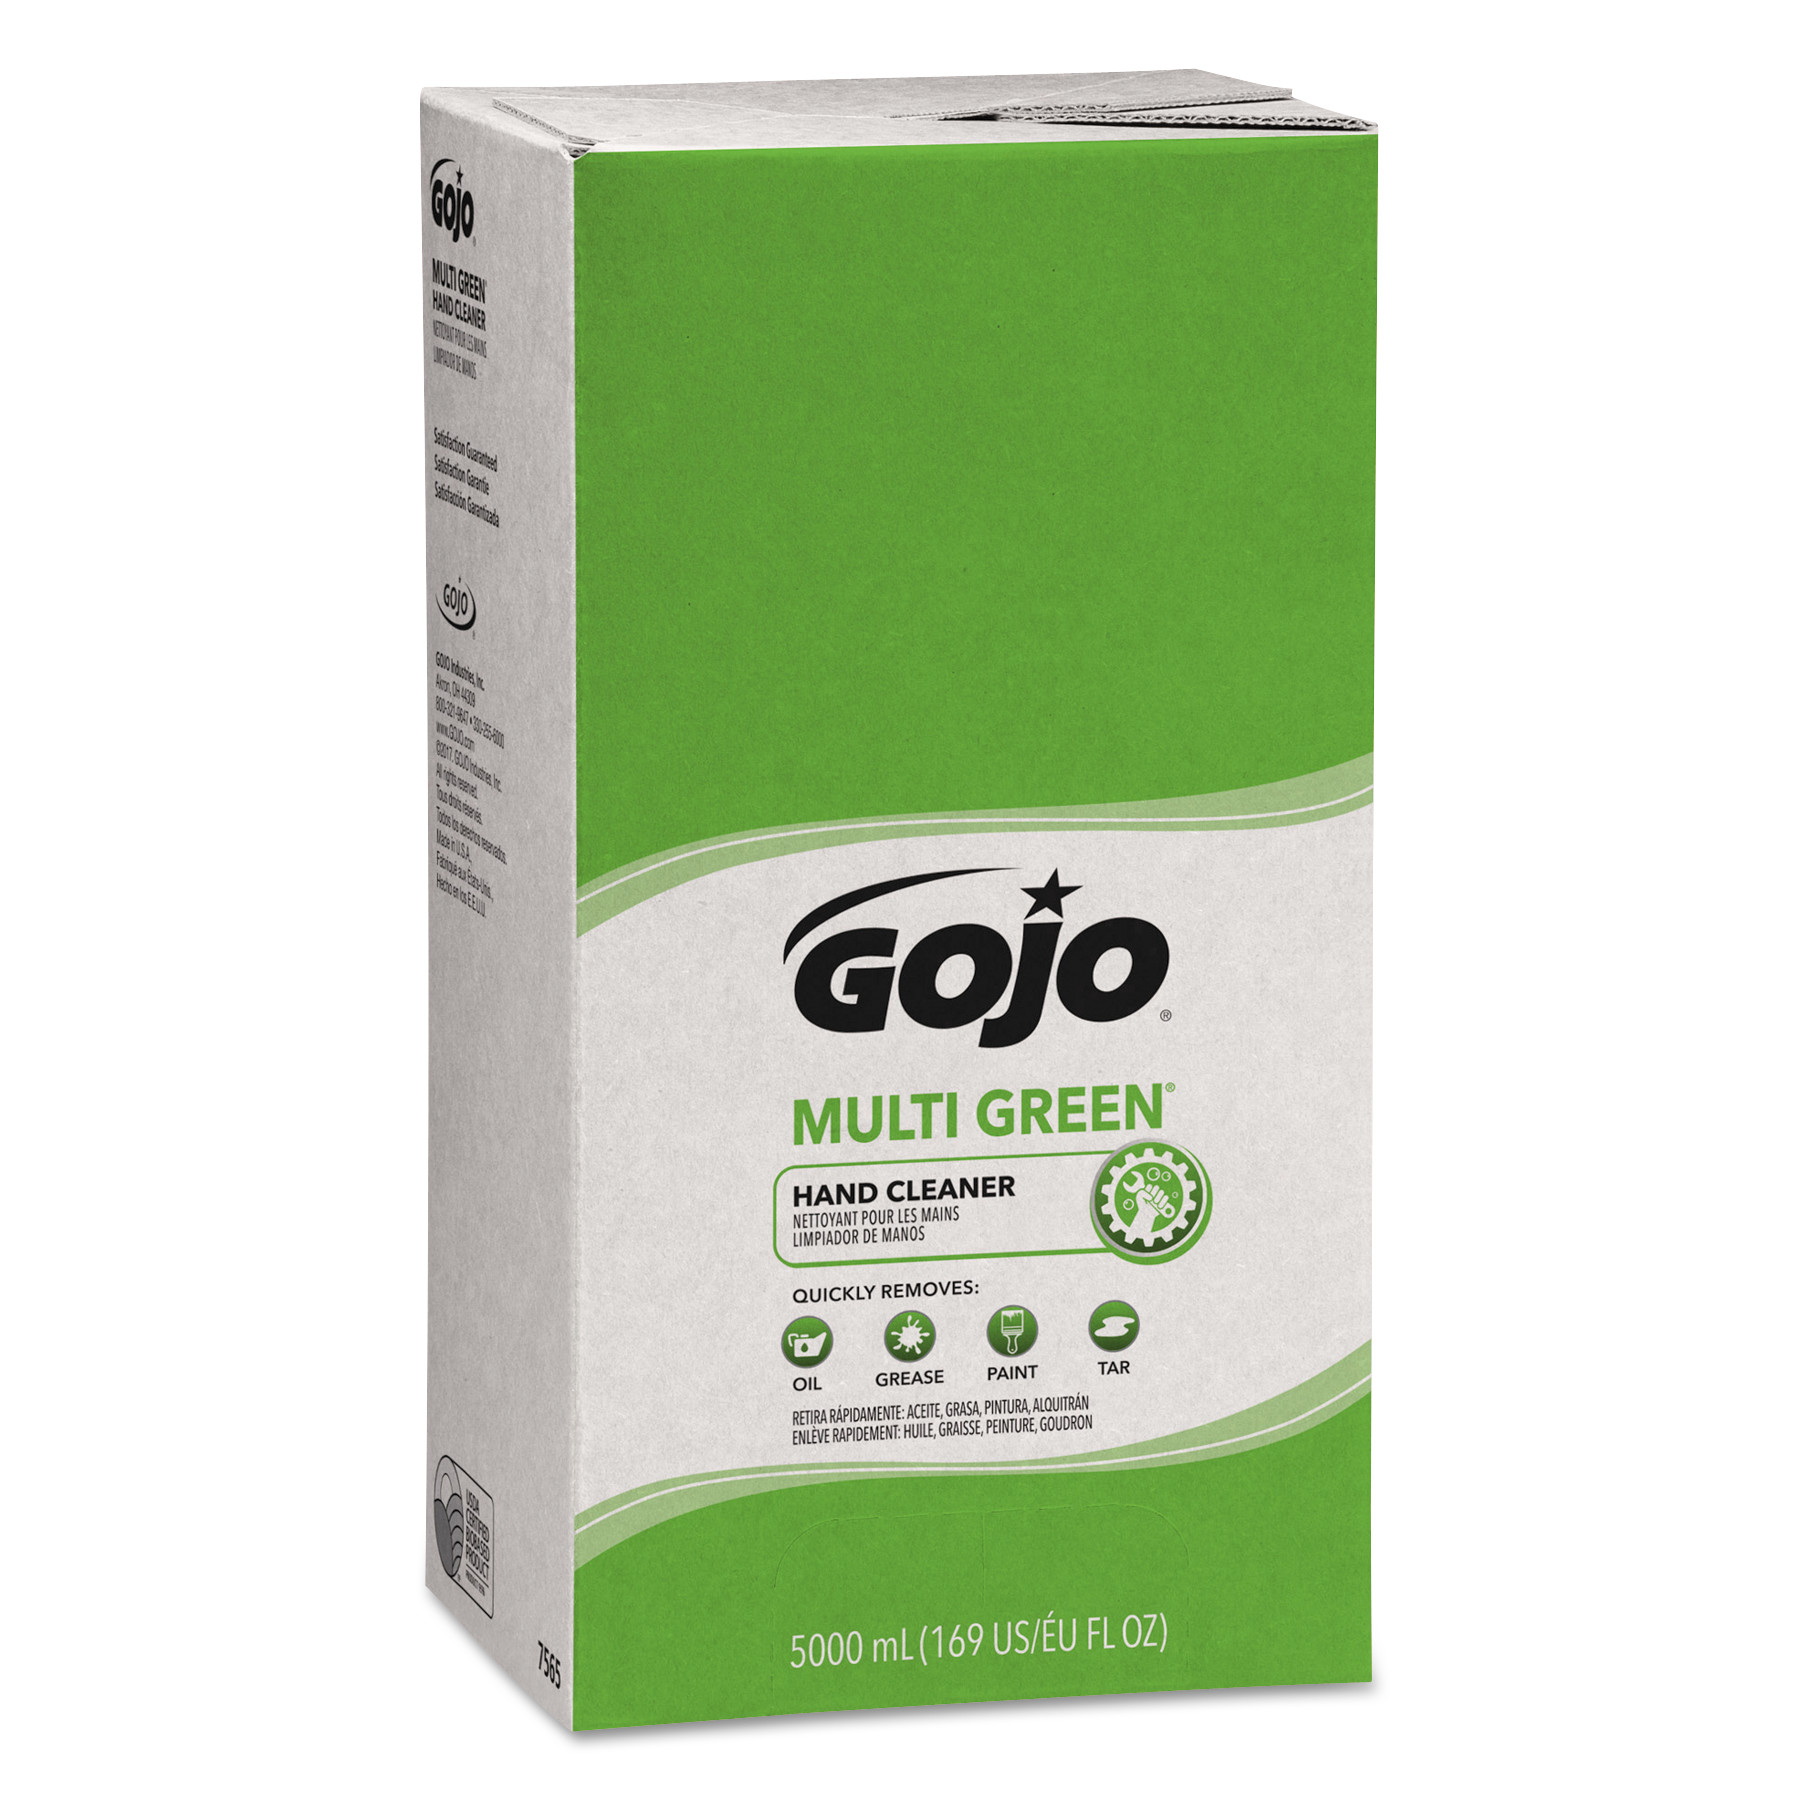 MULTI GREEN Hand Cleaner Refill, 5000mL, Citrus Scent, Green, 2/Carton